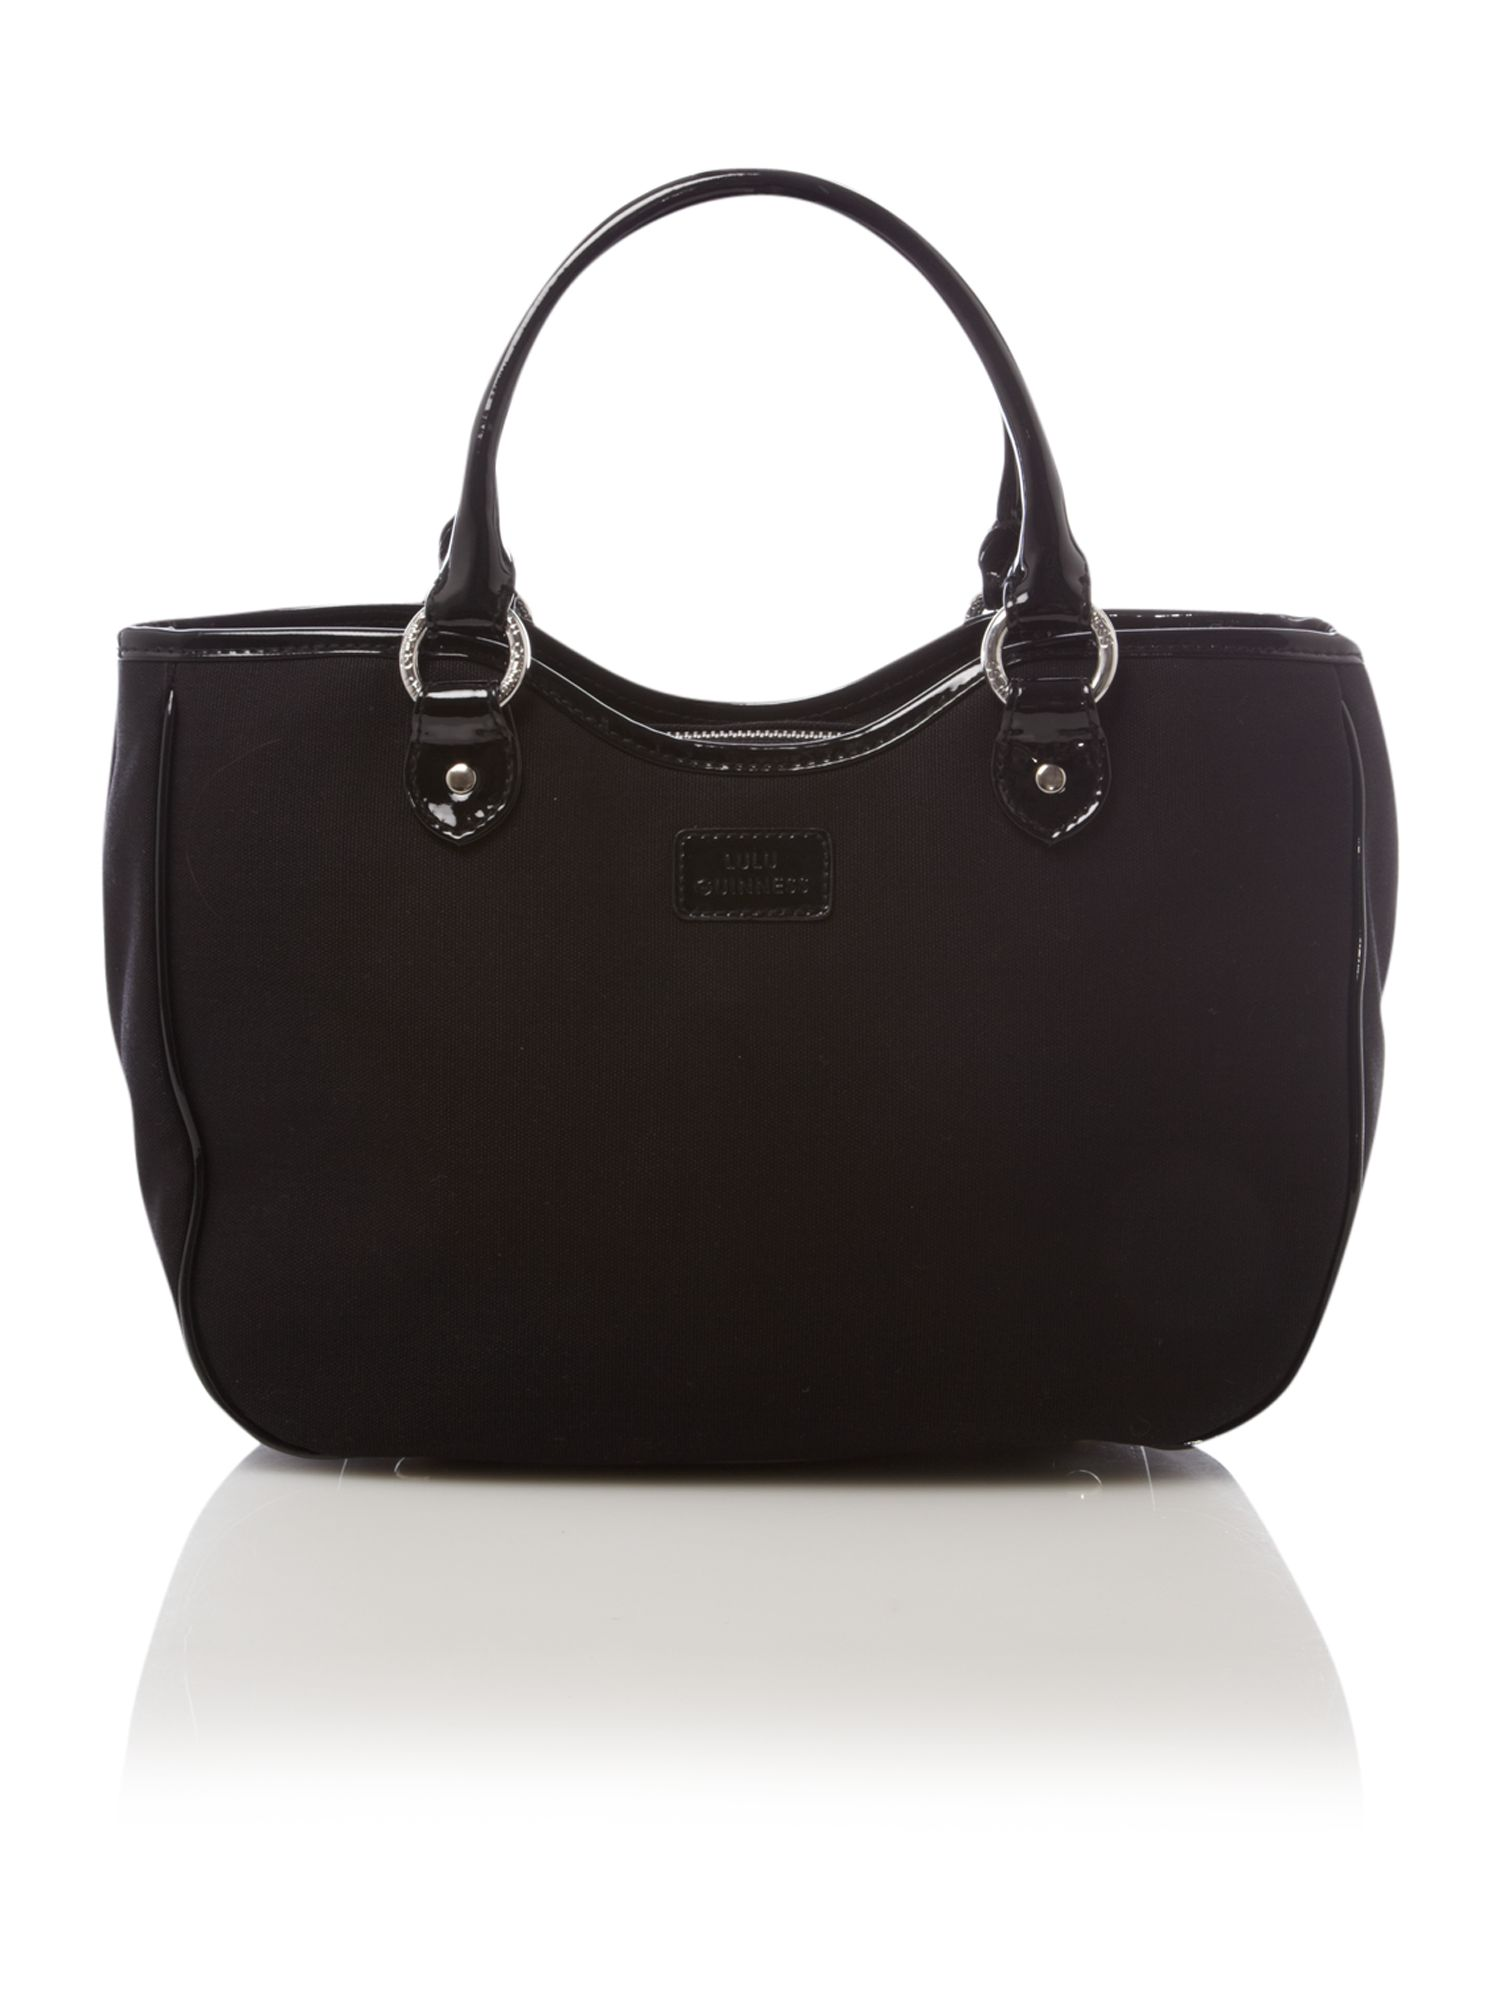 Lulu Guinness Small Wanda Tote Bag in Black